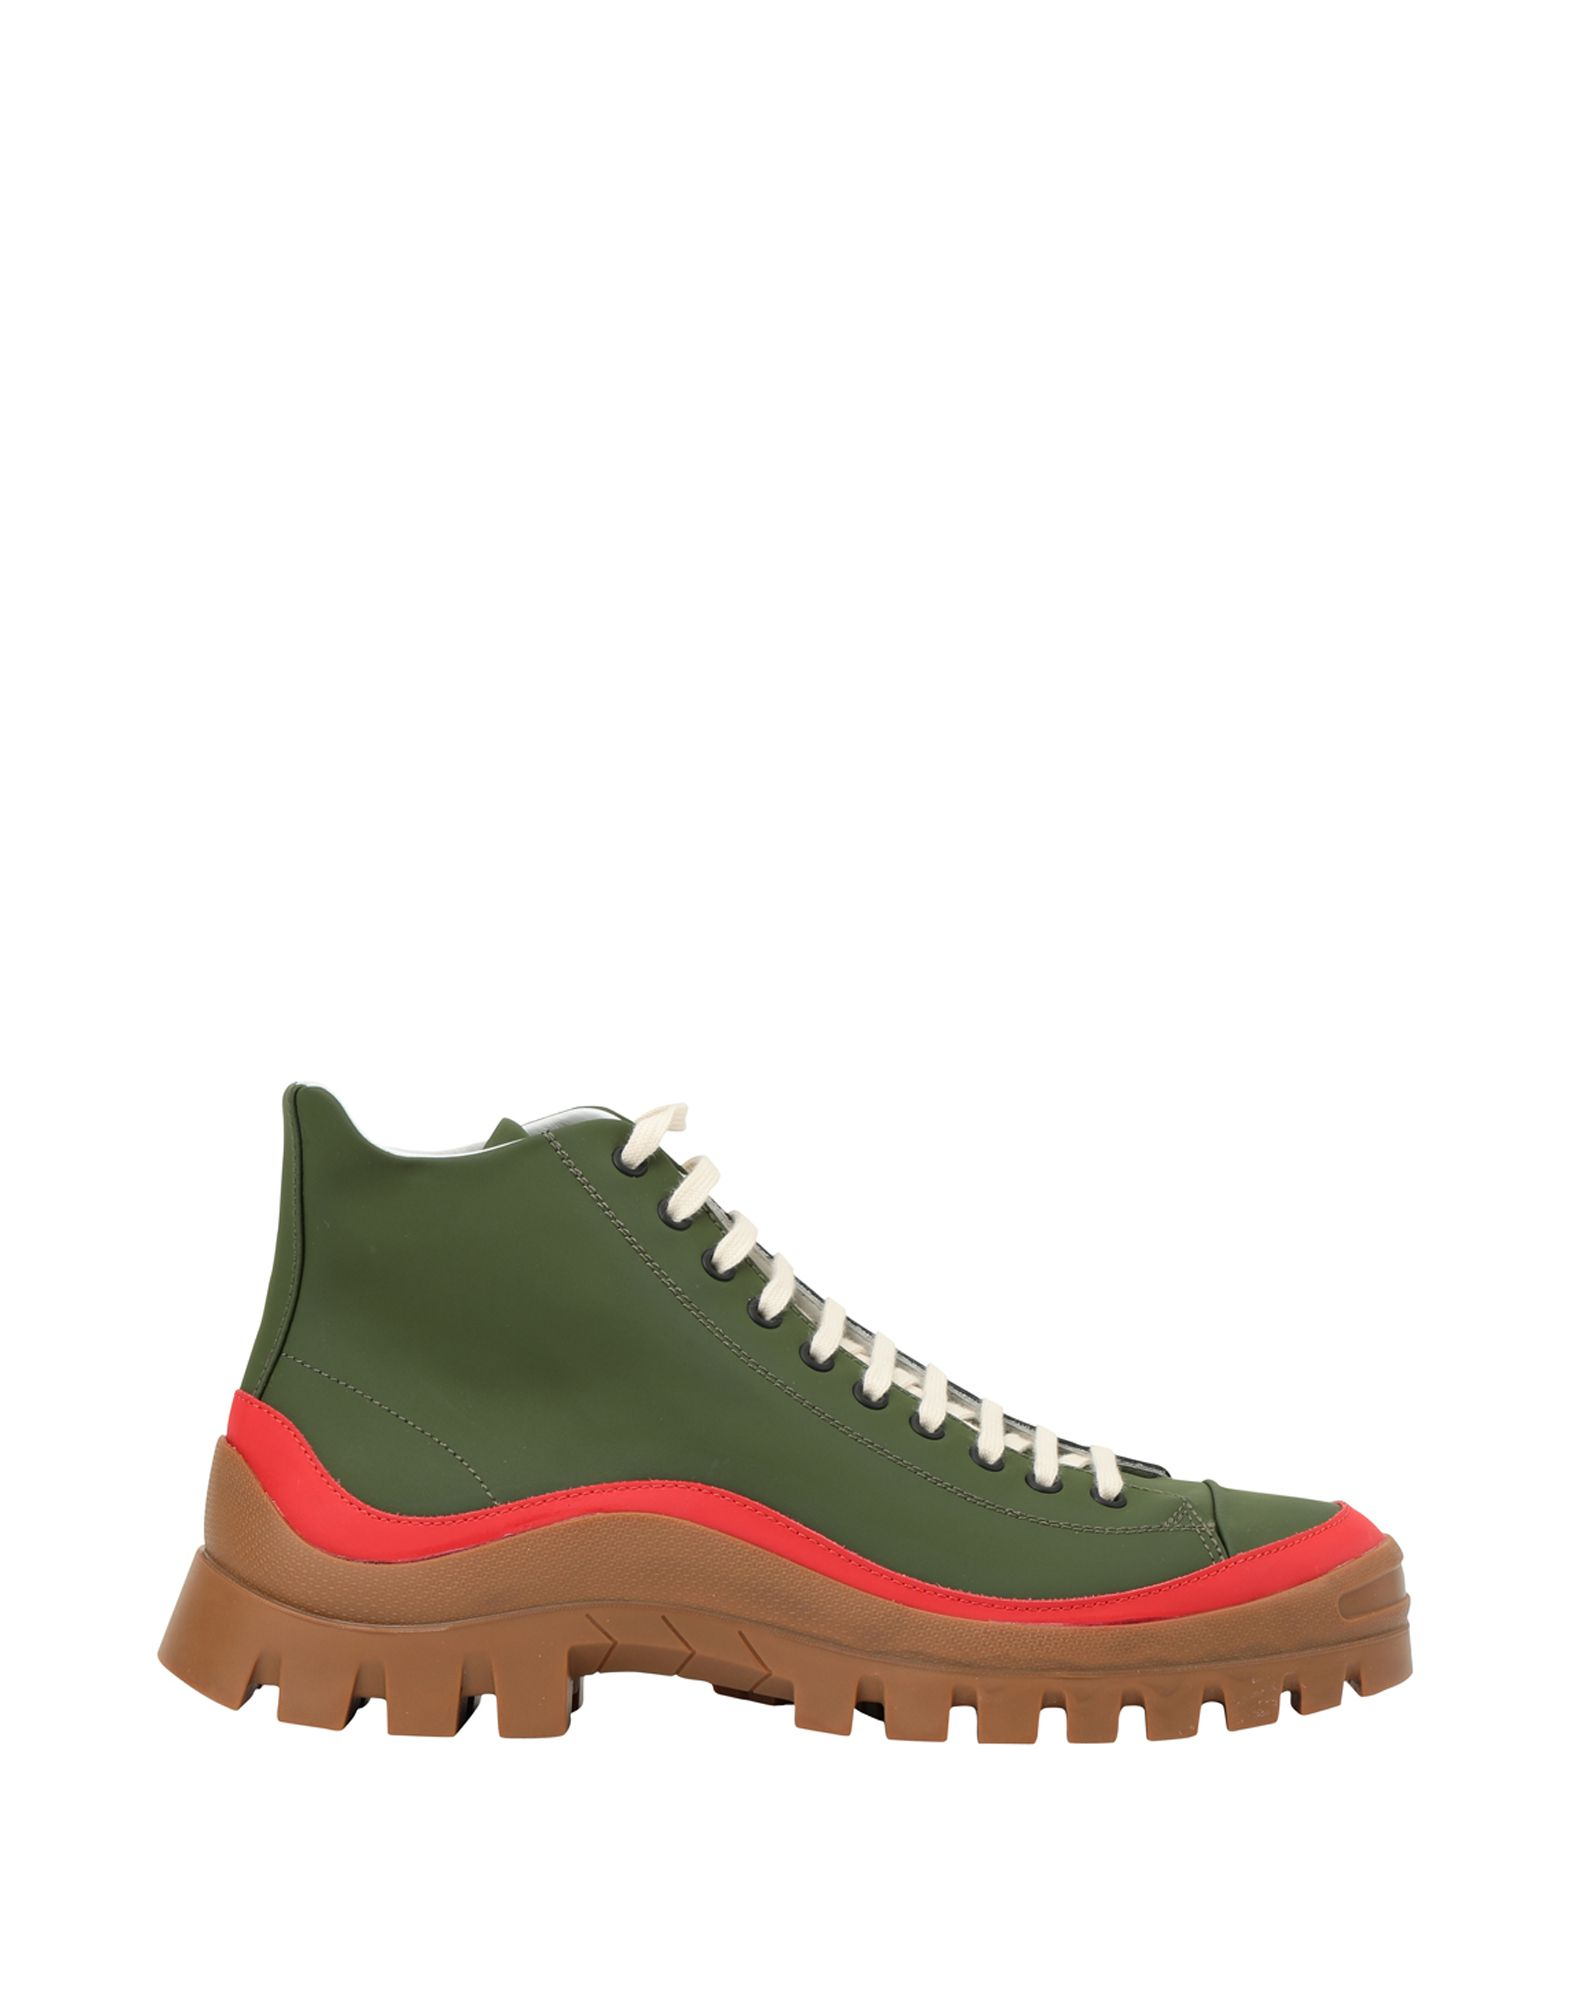 896e11a35dd Metalgienchi Clown Hi - - - Sneakers - Men Metalgienchi Sneakers online on  United Kingdom - 11540283QA c064cf